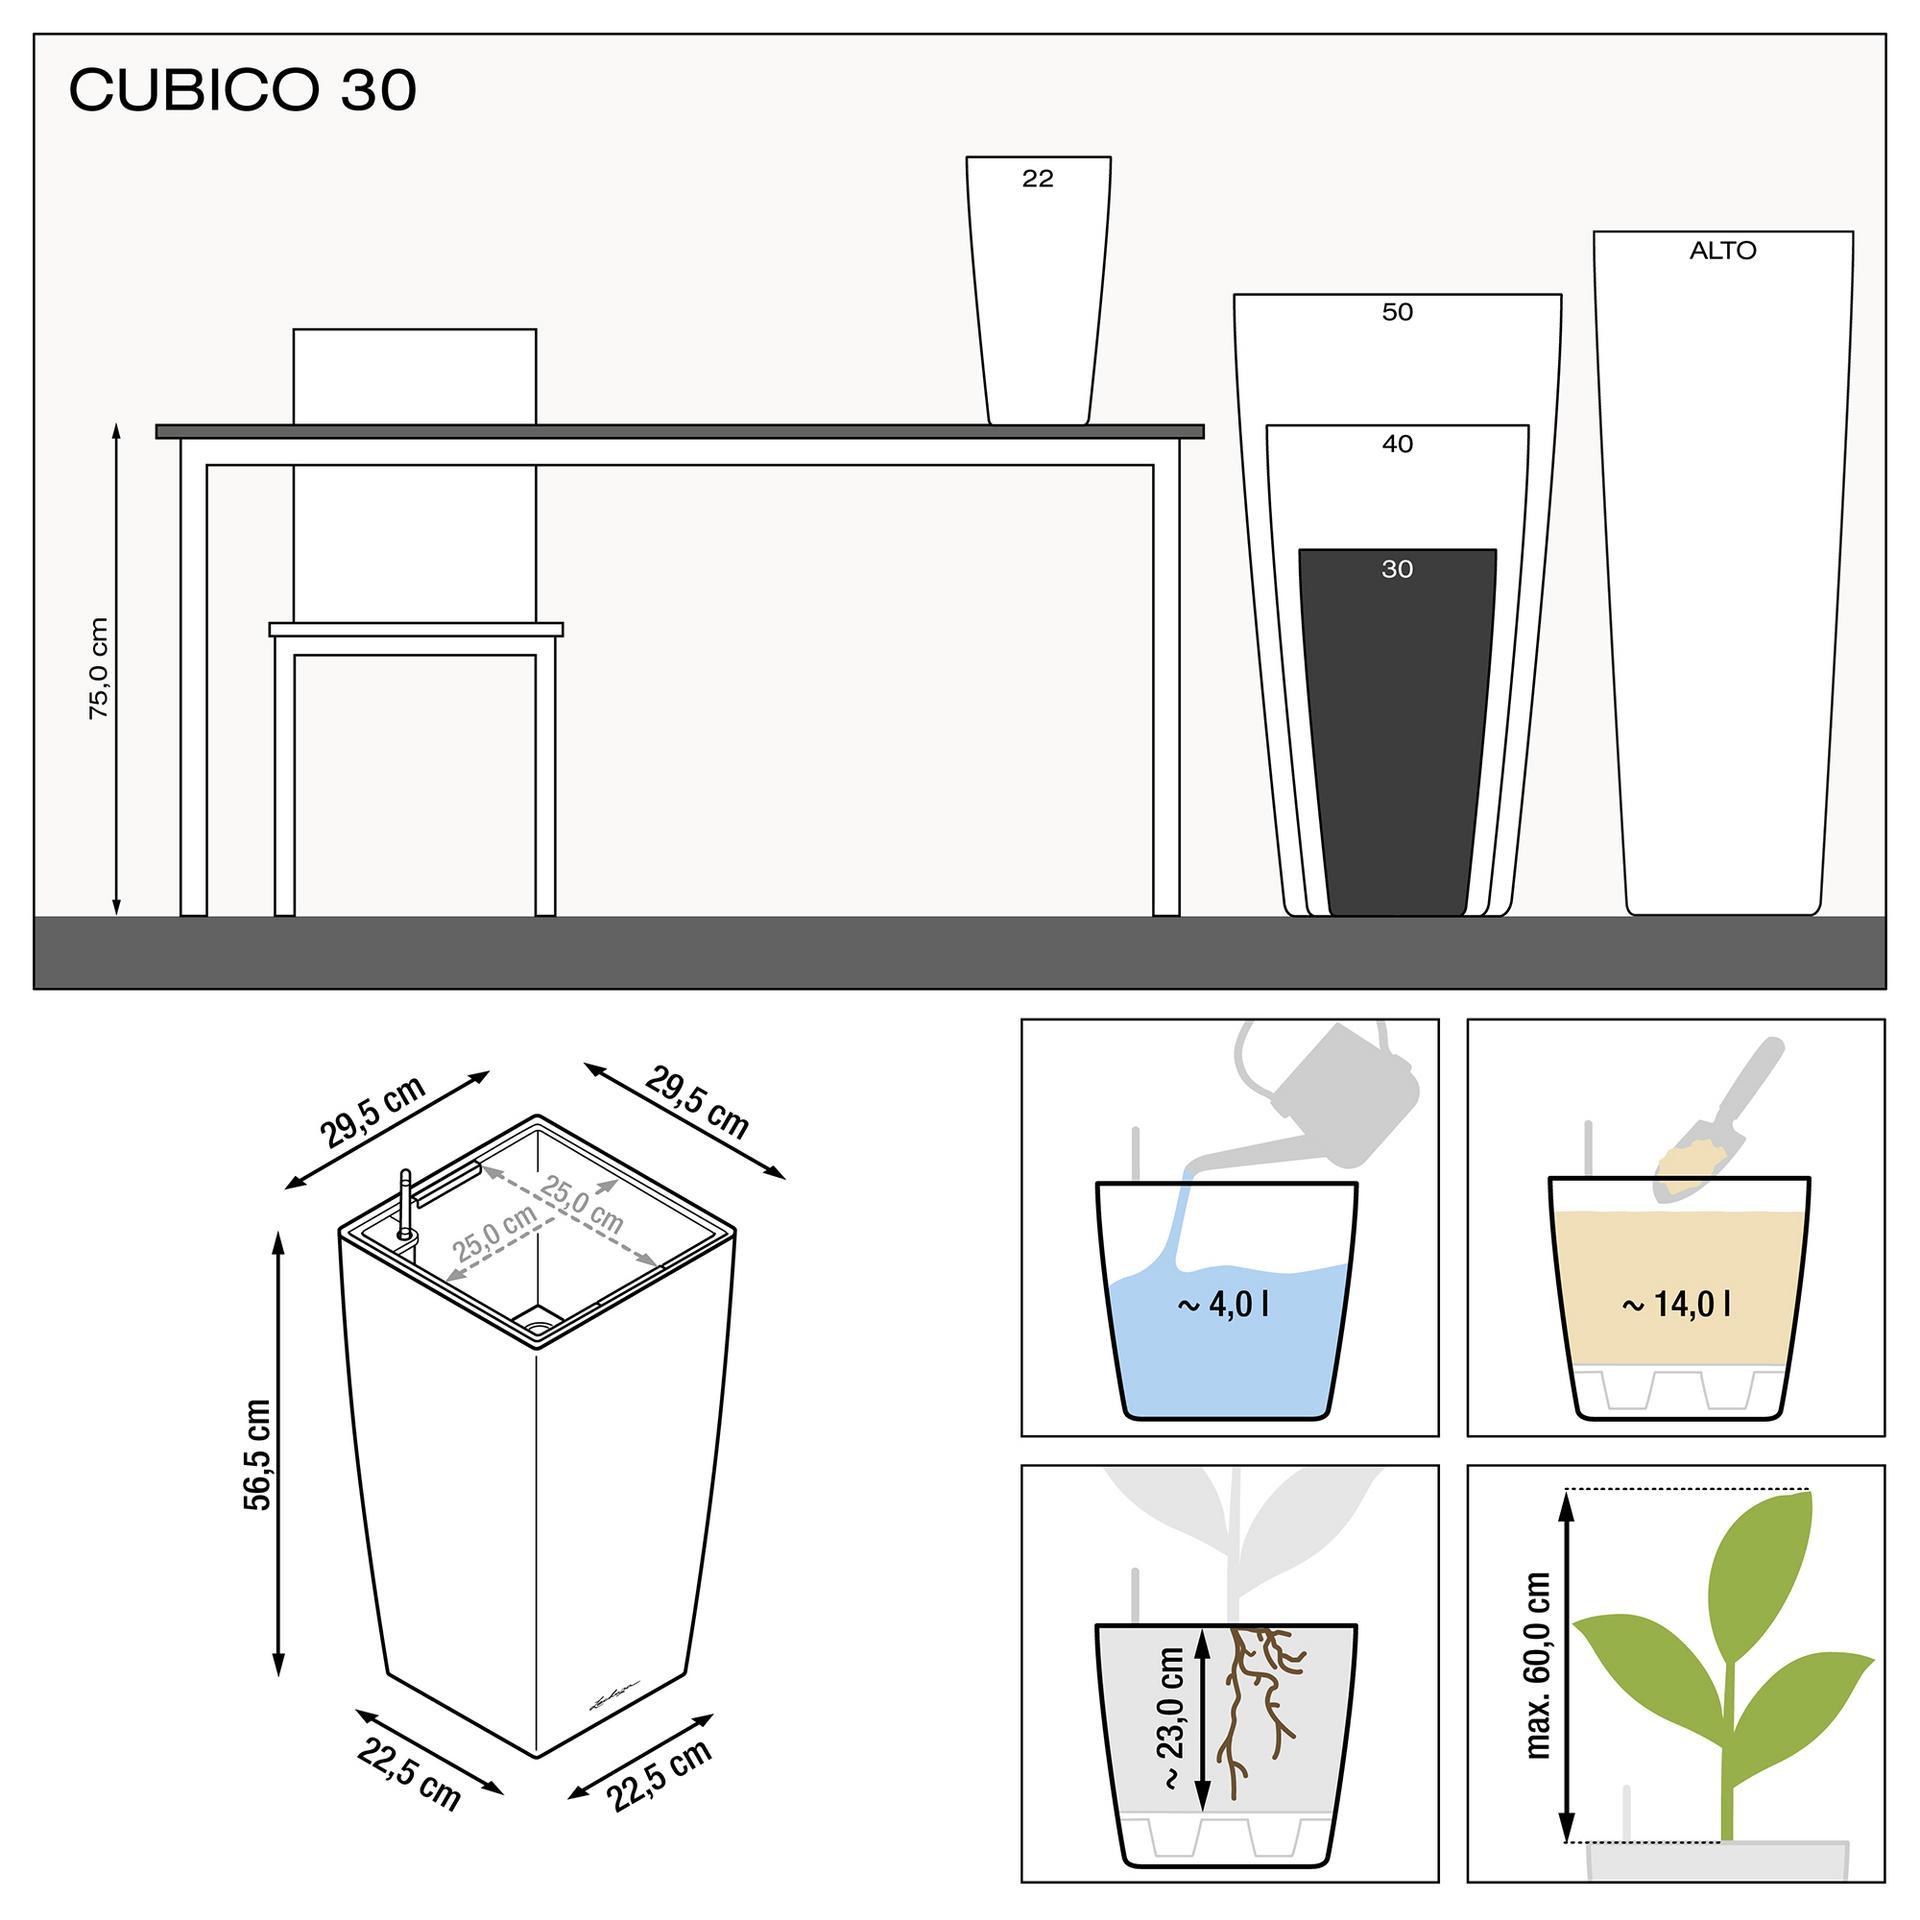 le_cubico30_product_addi_nz